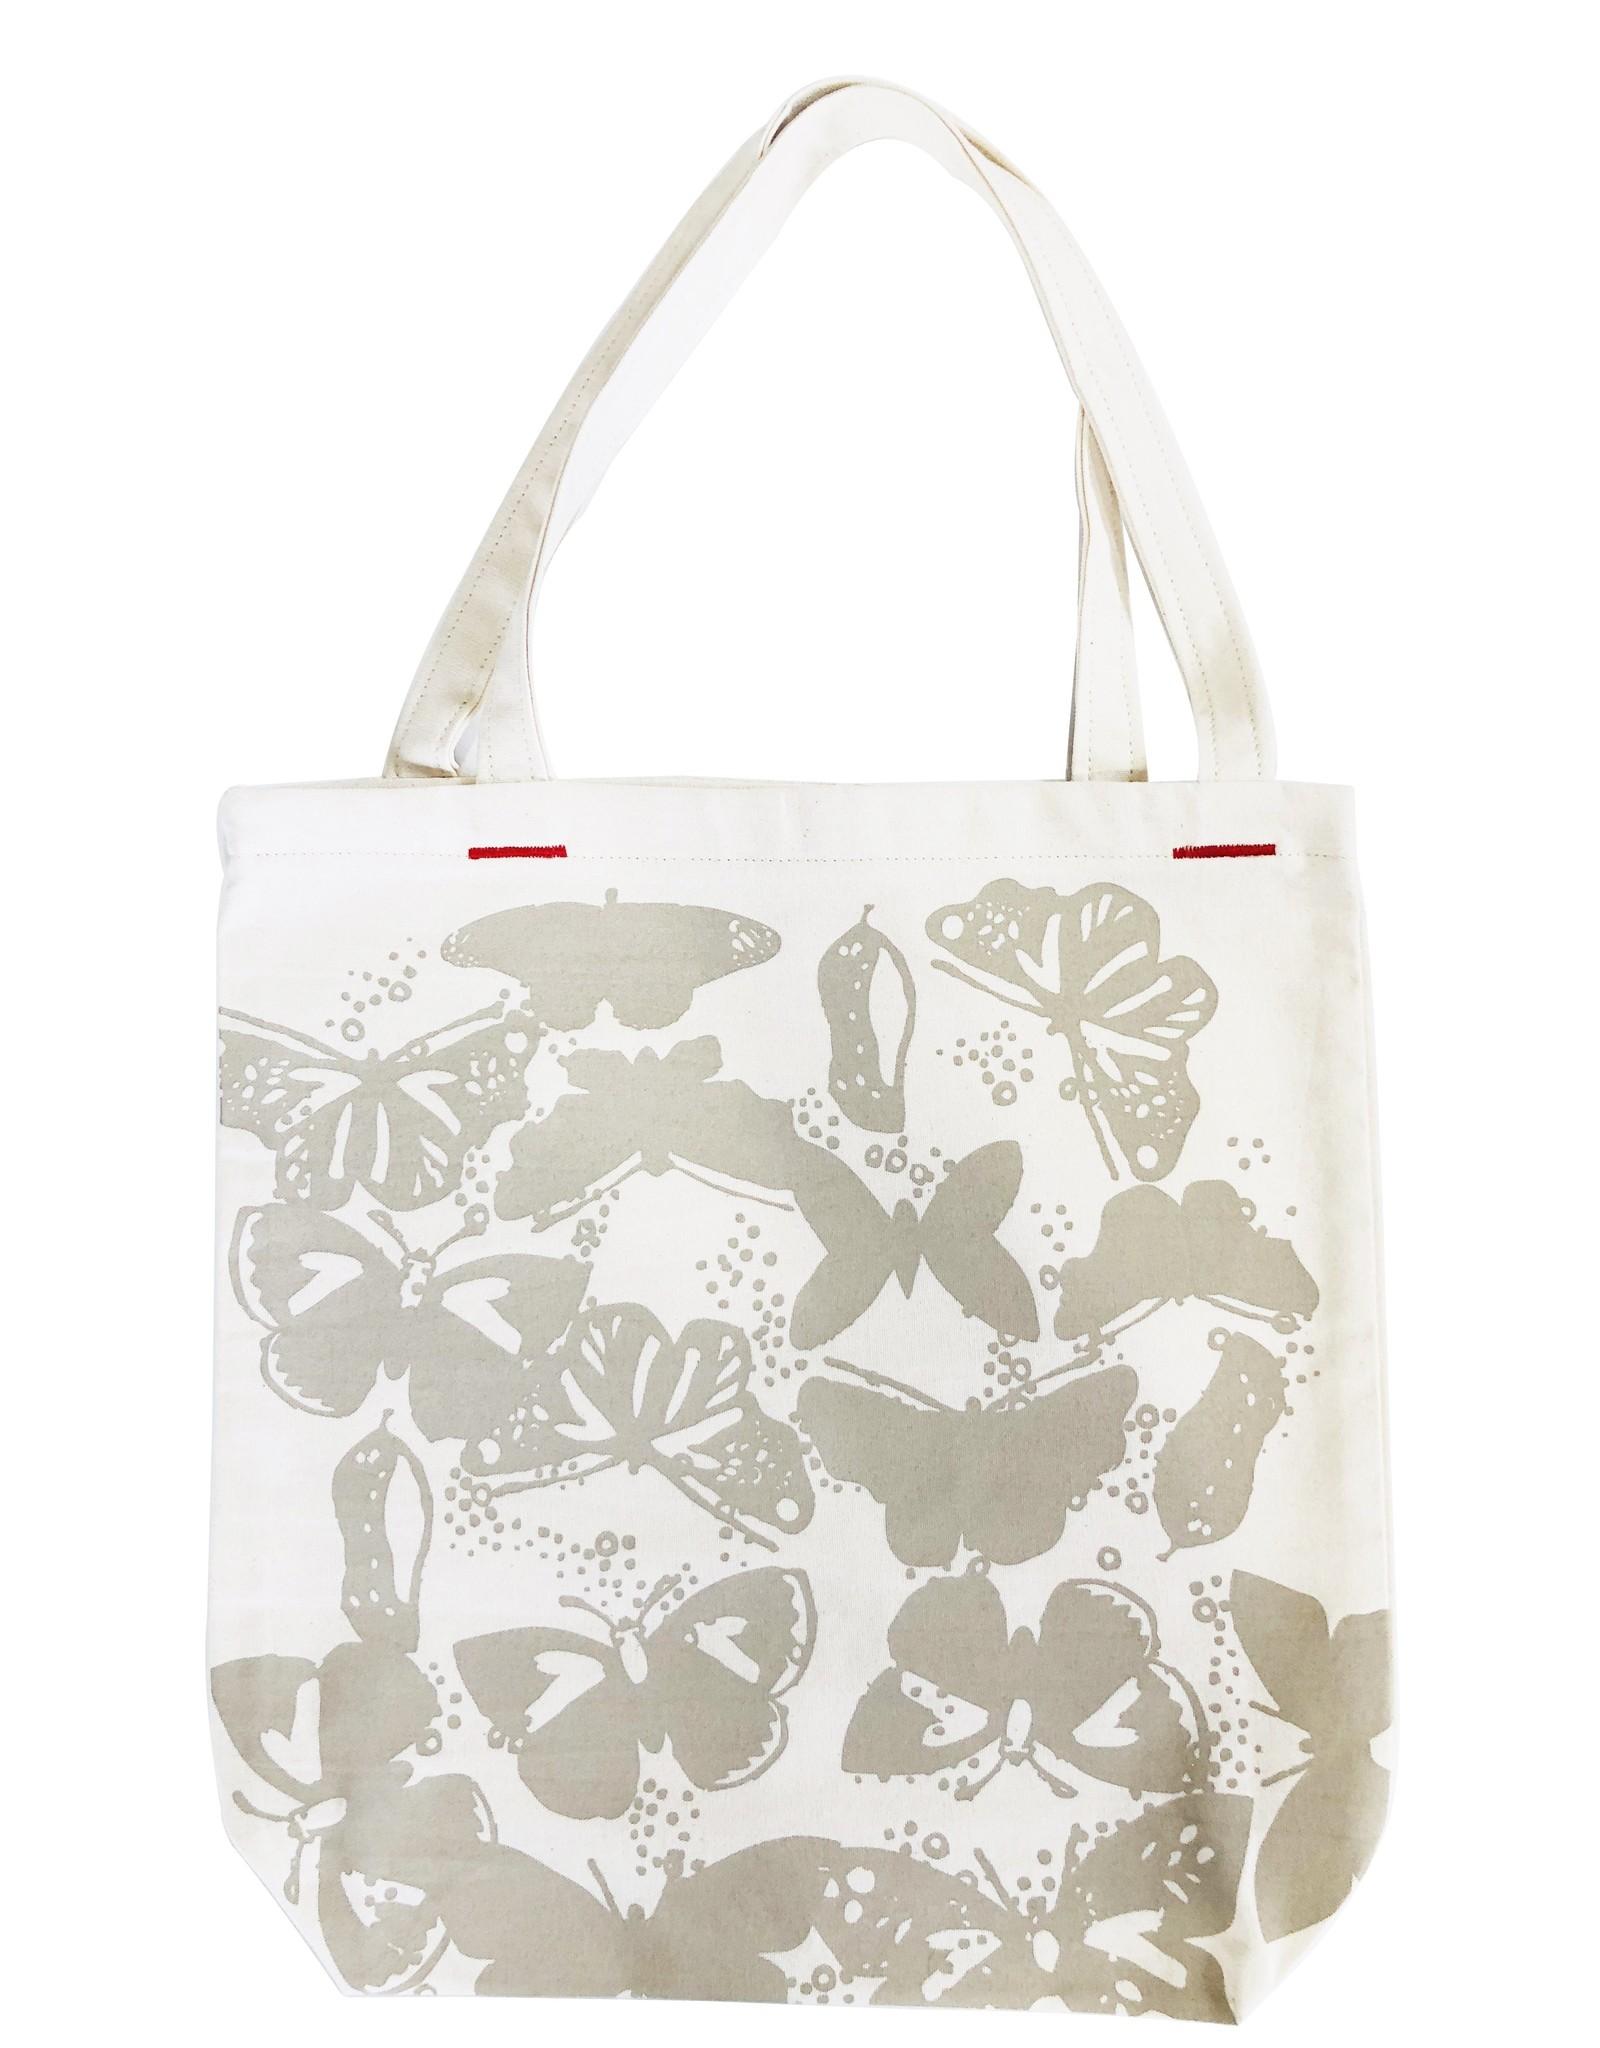 Erin Flett Carry All Bags by Erin Flett